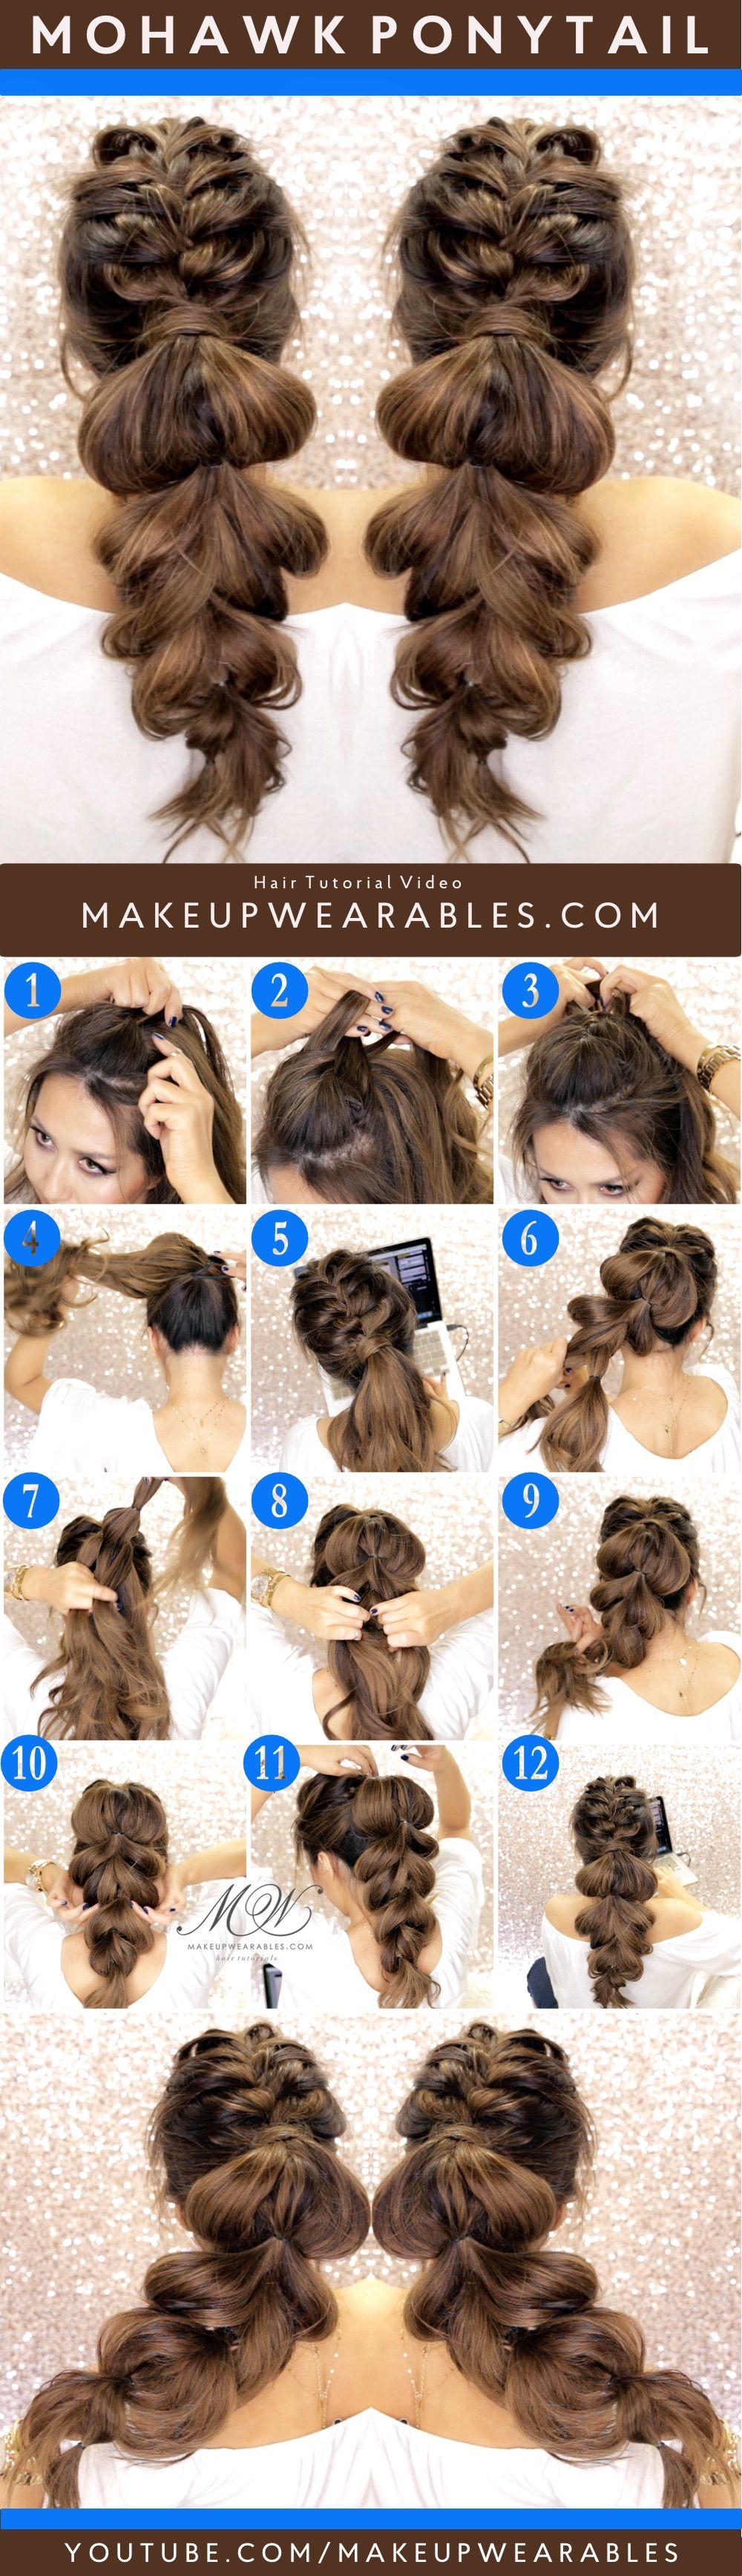 Cute braided ponytail hairstyles hair beauty 헤어